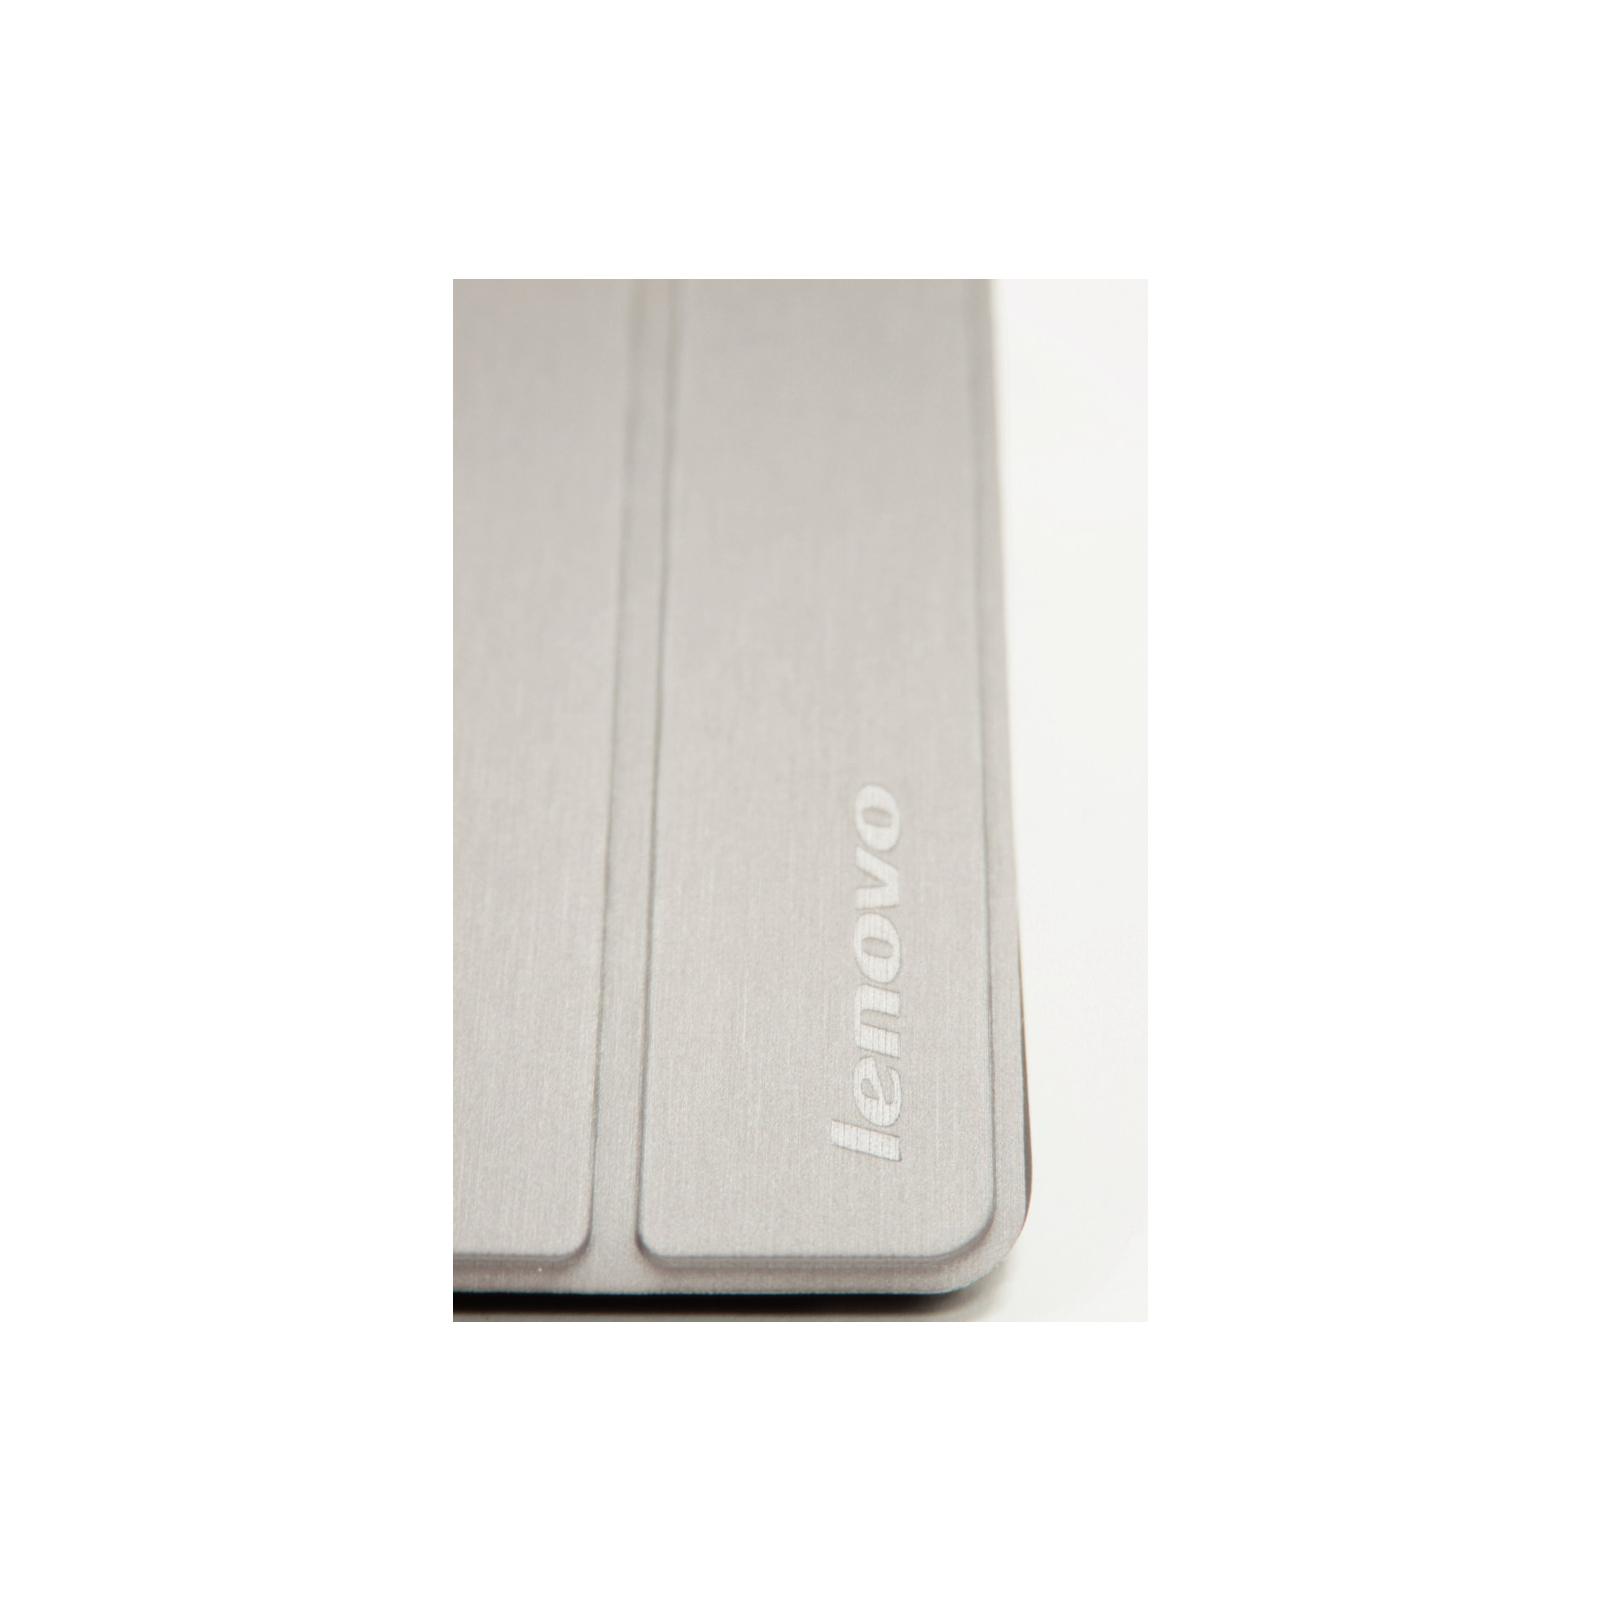 "Чехол для планшета Lenovo 10"" А7600 Folio Case and film silver (888016534) изображение 2"